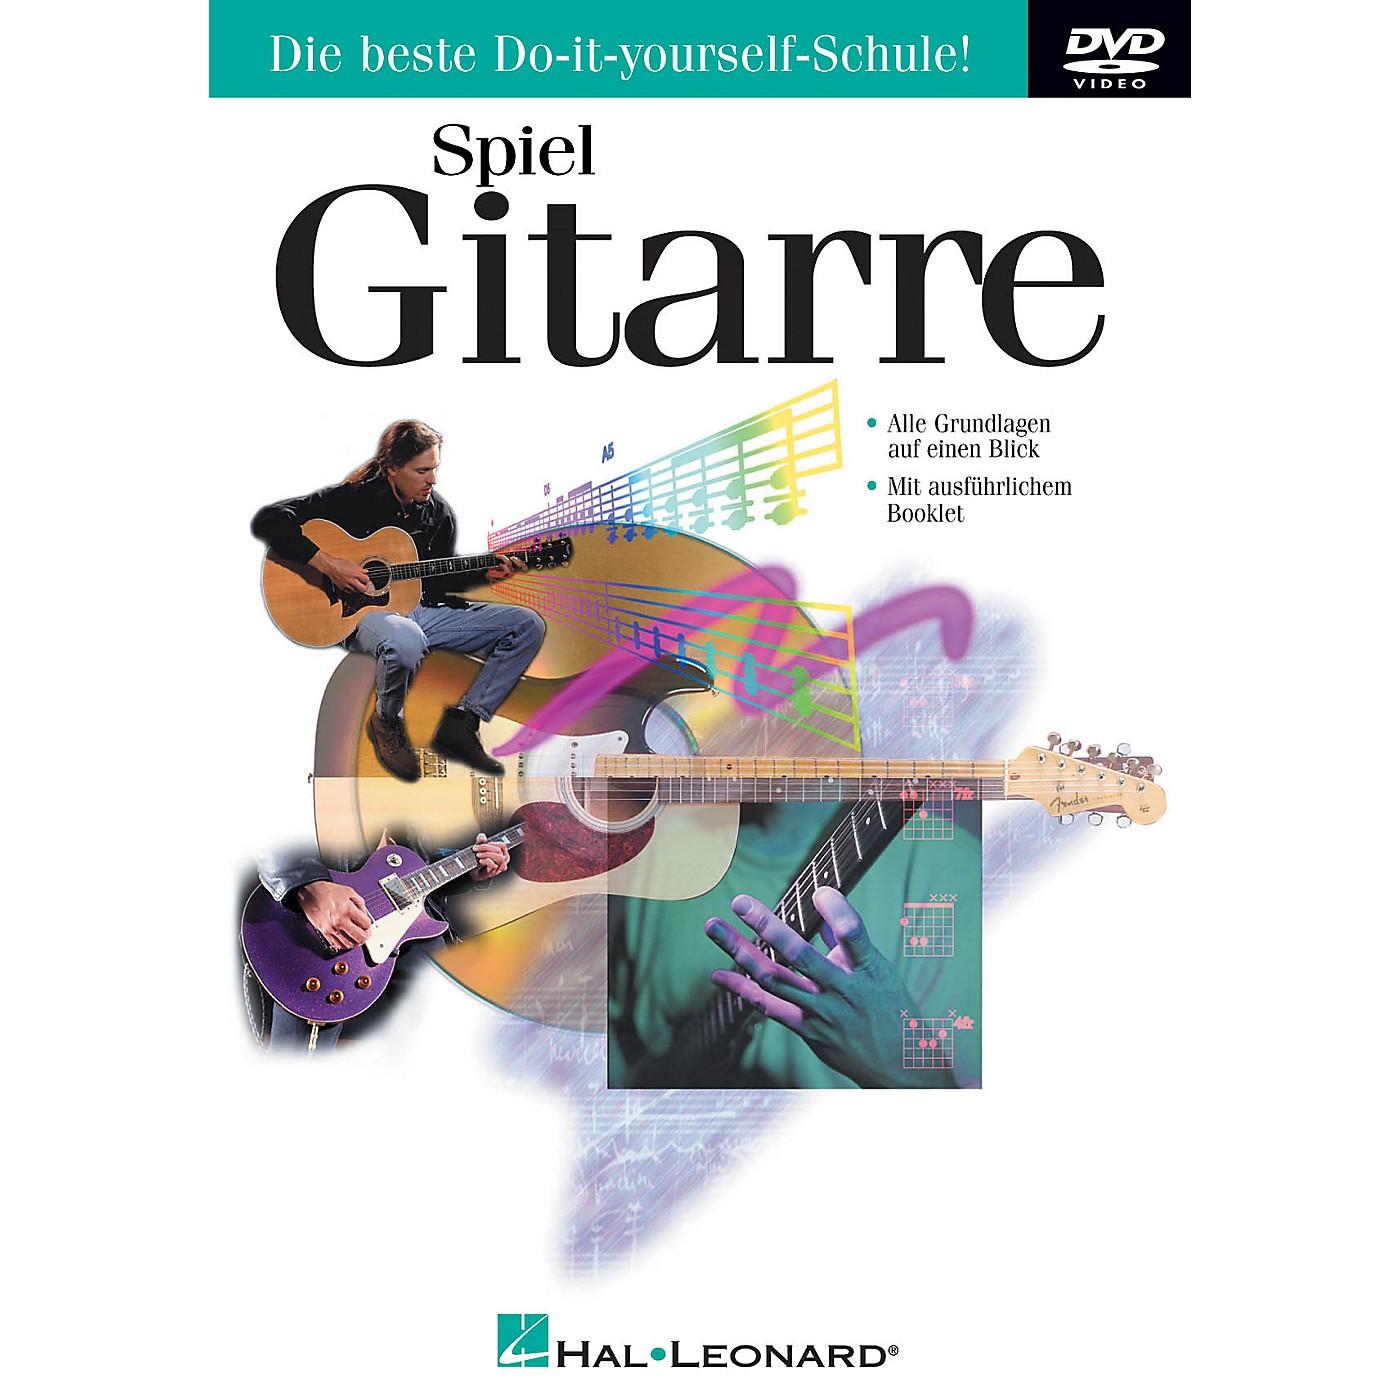 Hal Leonard Play Guitar Today (Spiel Gitarre) DVD Series DVD Written by Doug Boduch thumbnail